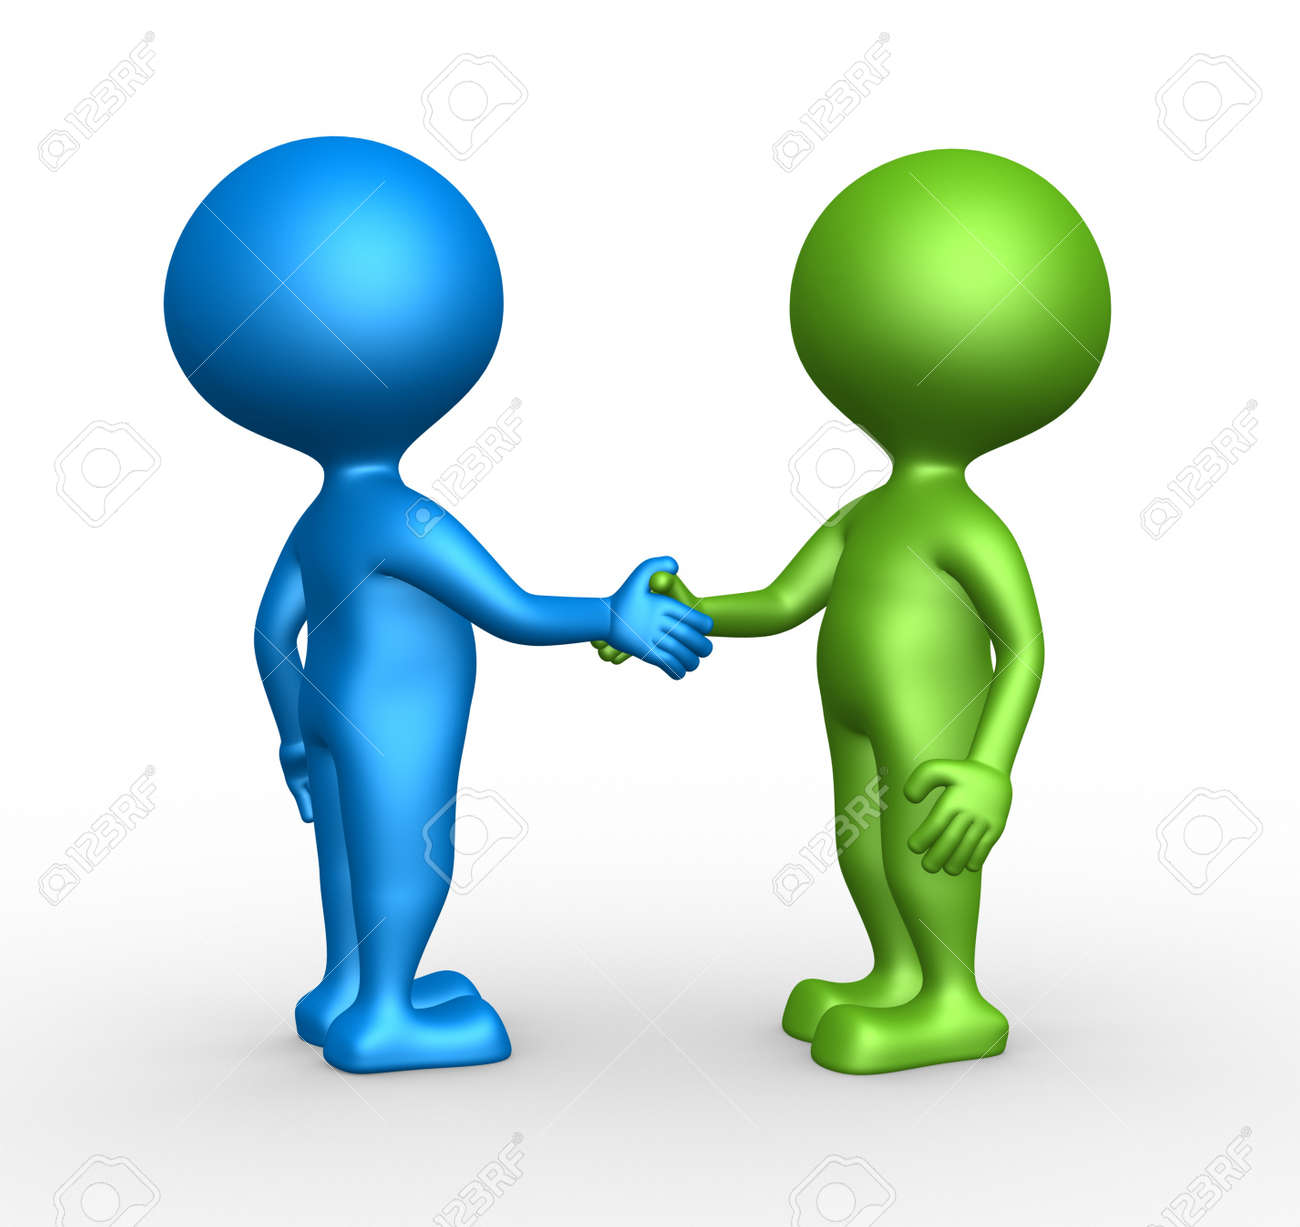 3d people - man, person partnership - handshake. Stock Photo - 21138650